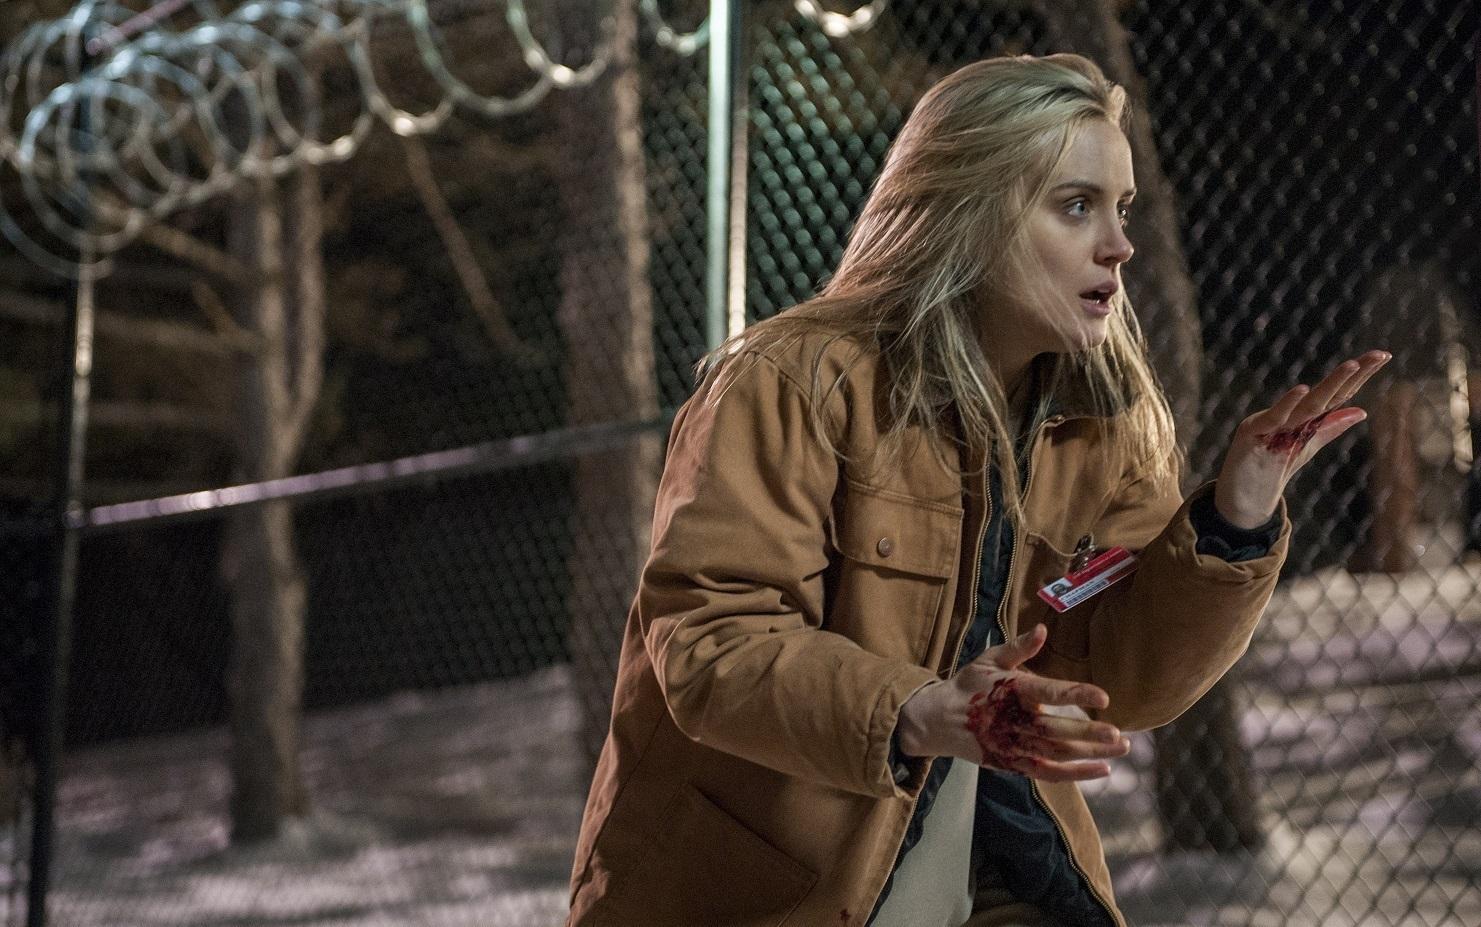 A Peek At The New Season Of 'Orange Is The New Black' | WCAI